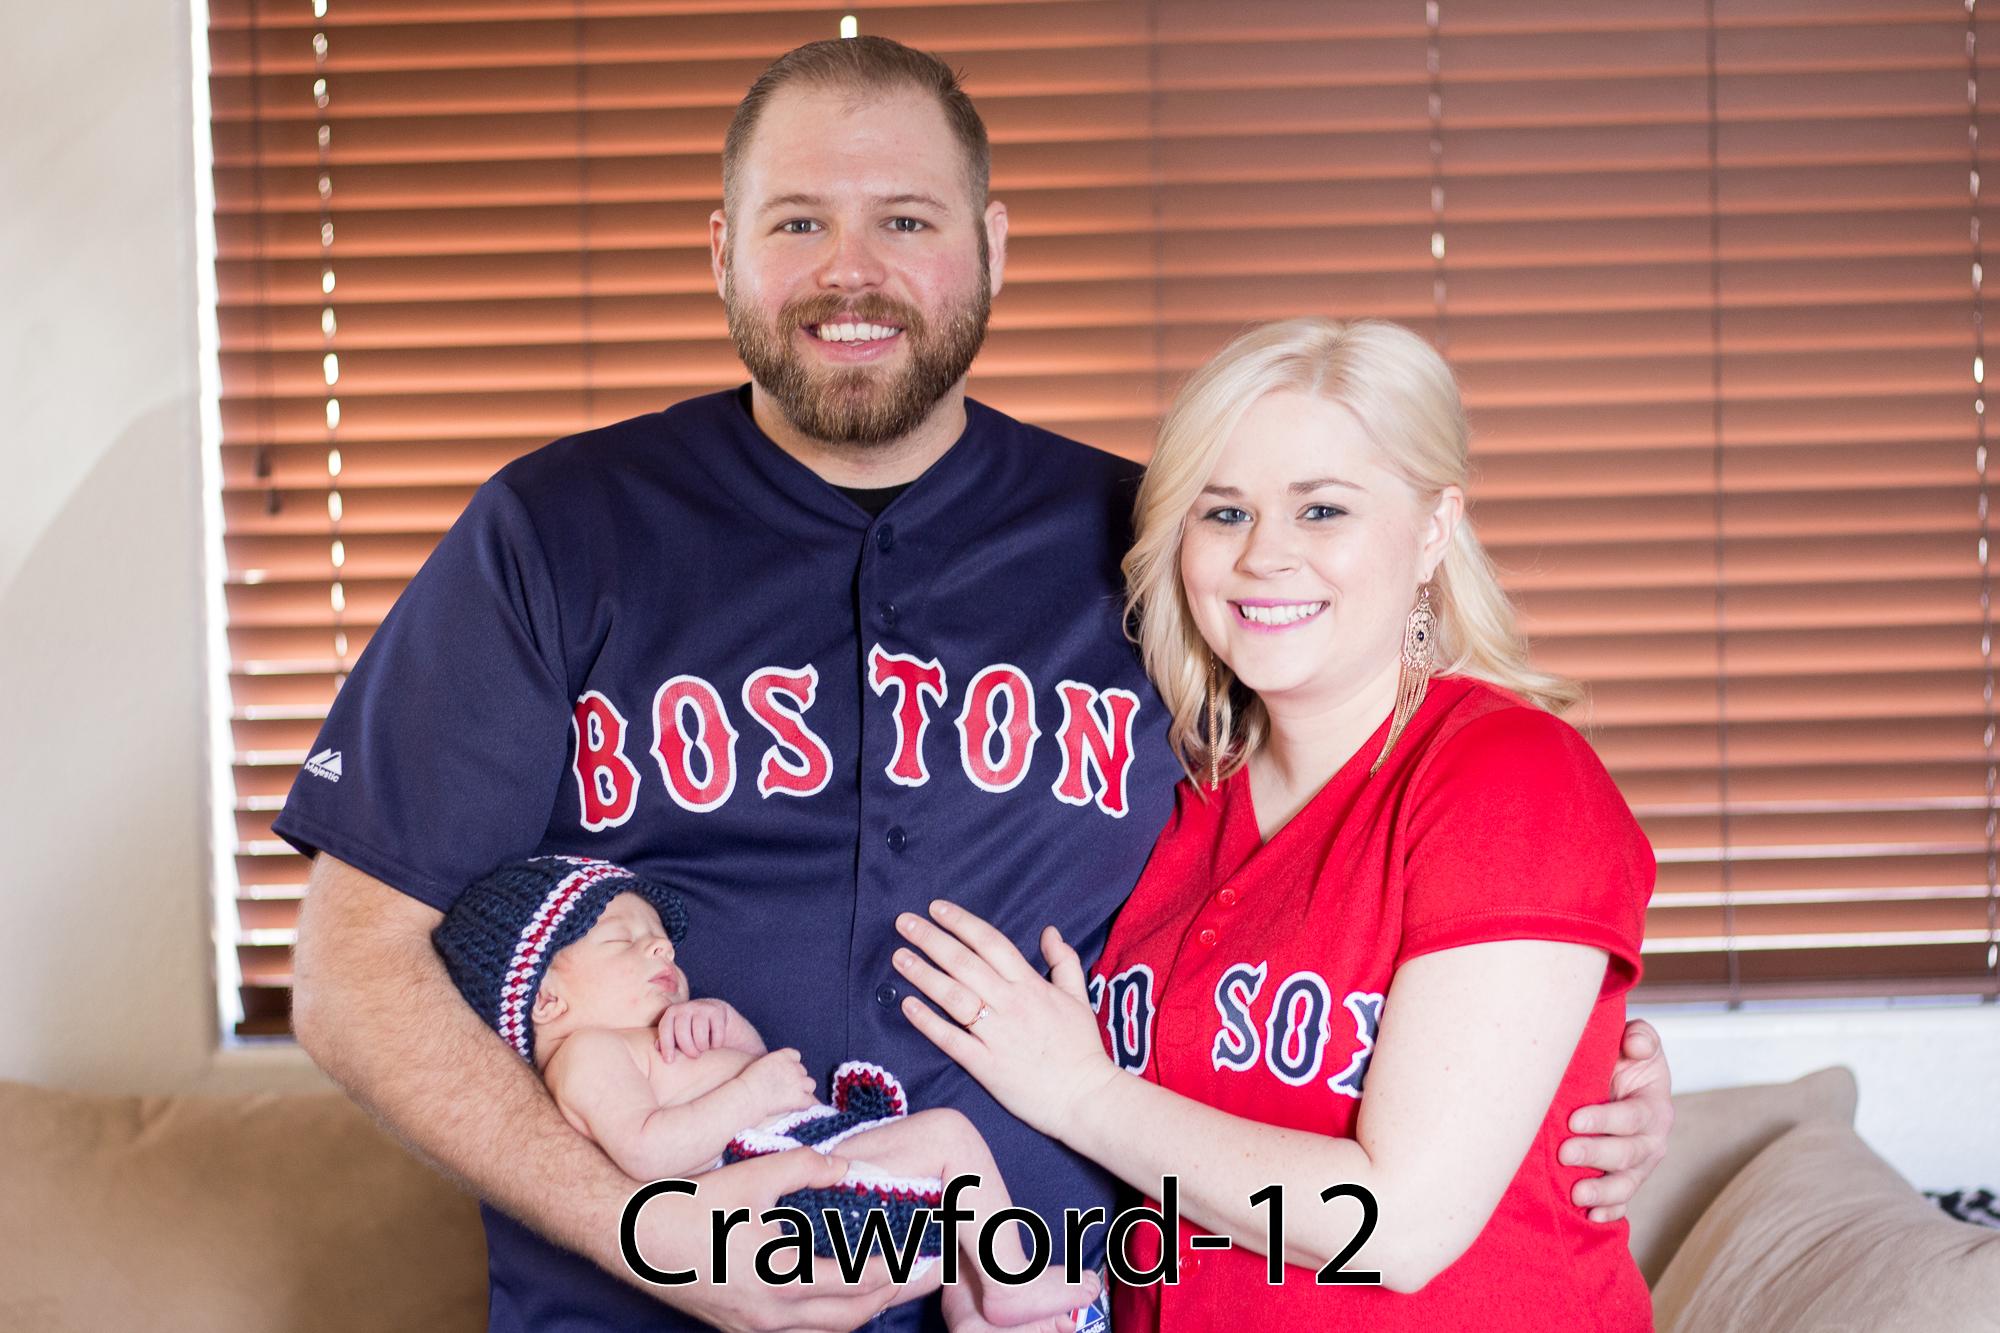 Crawford-12.jpg